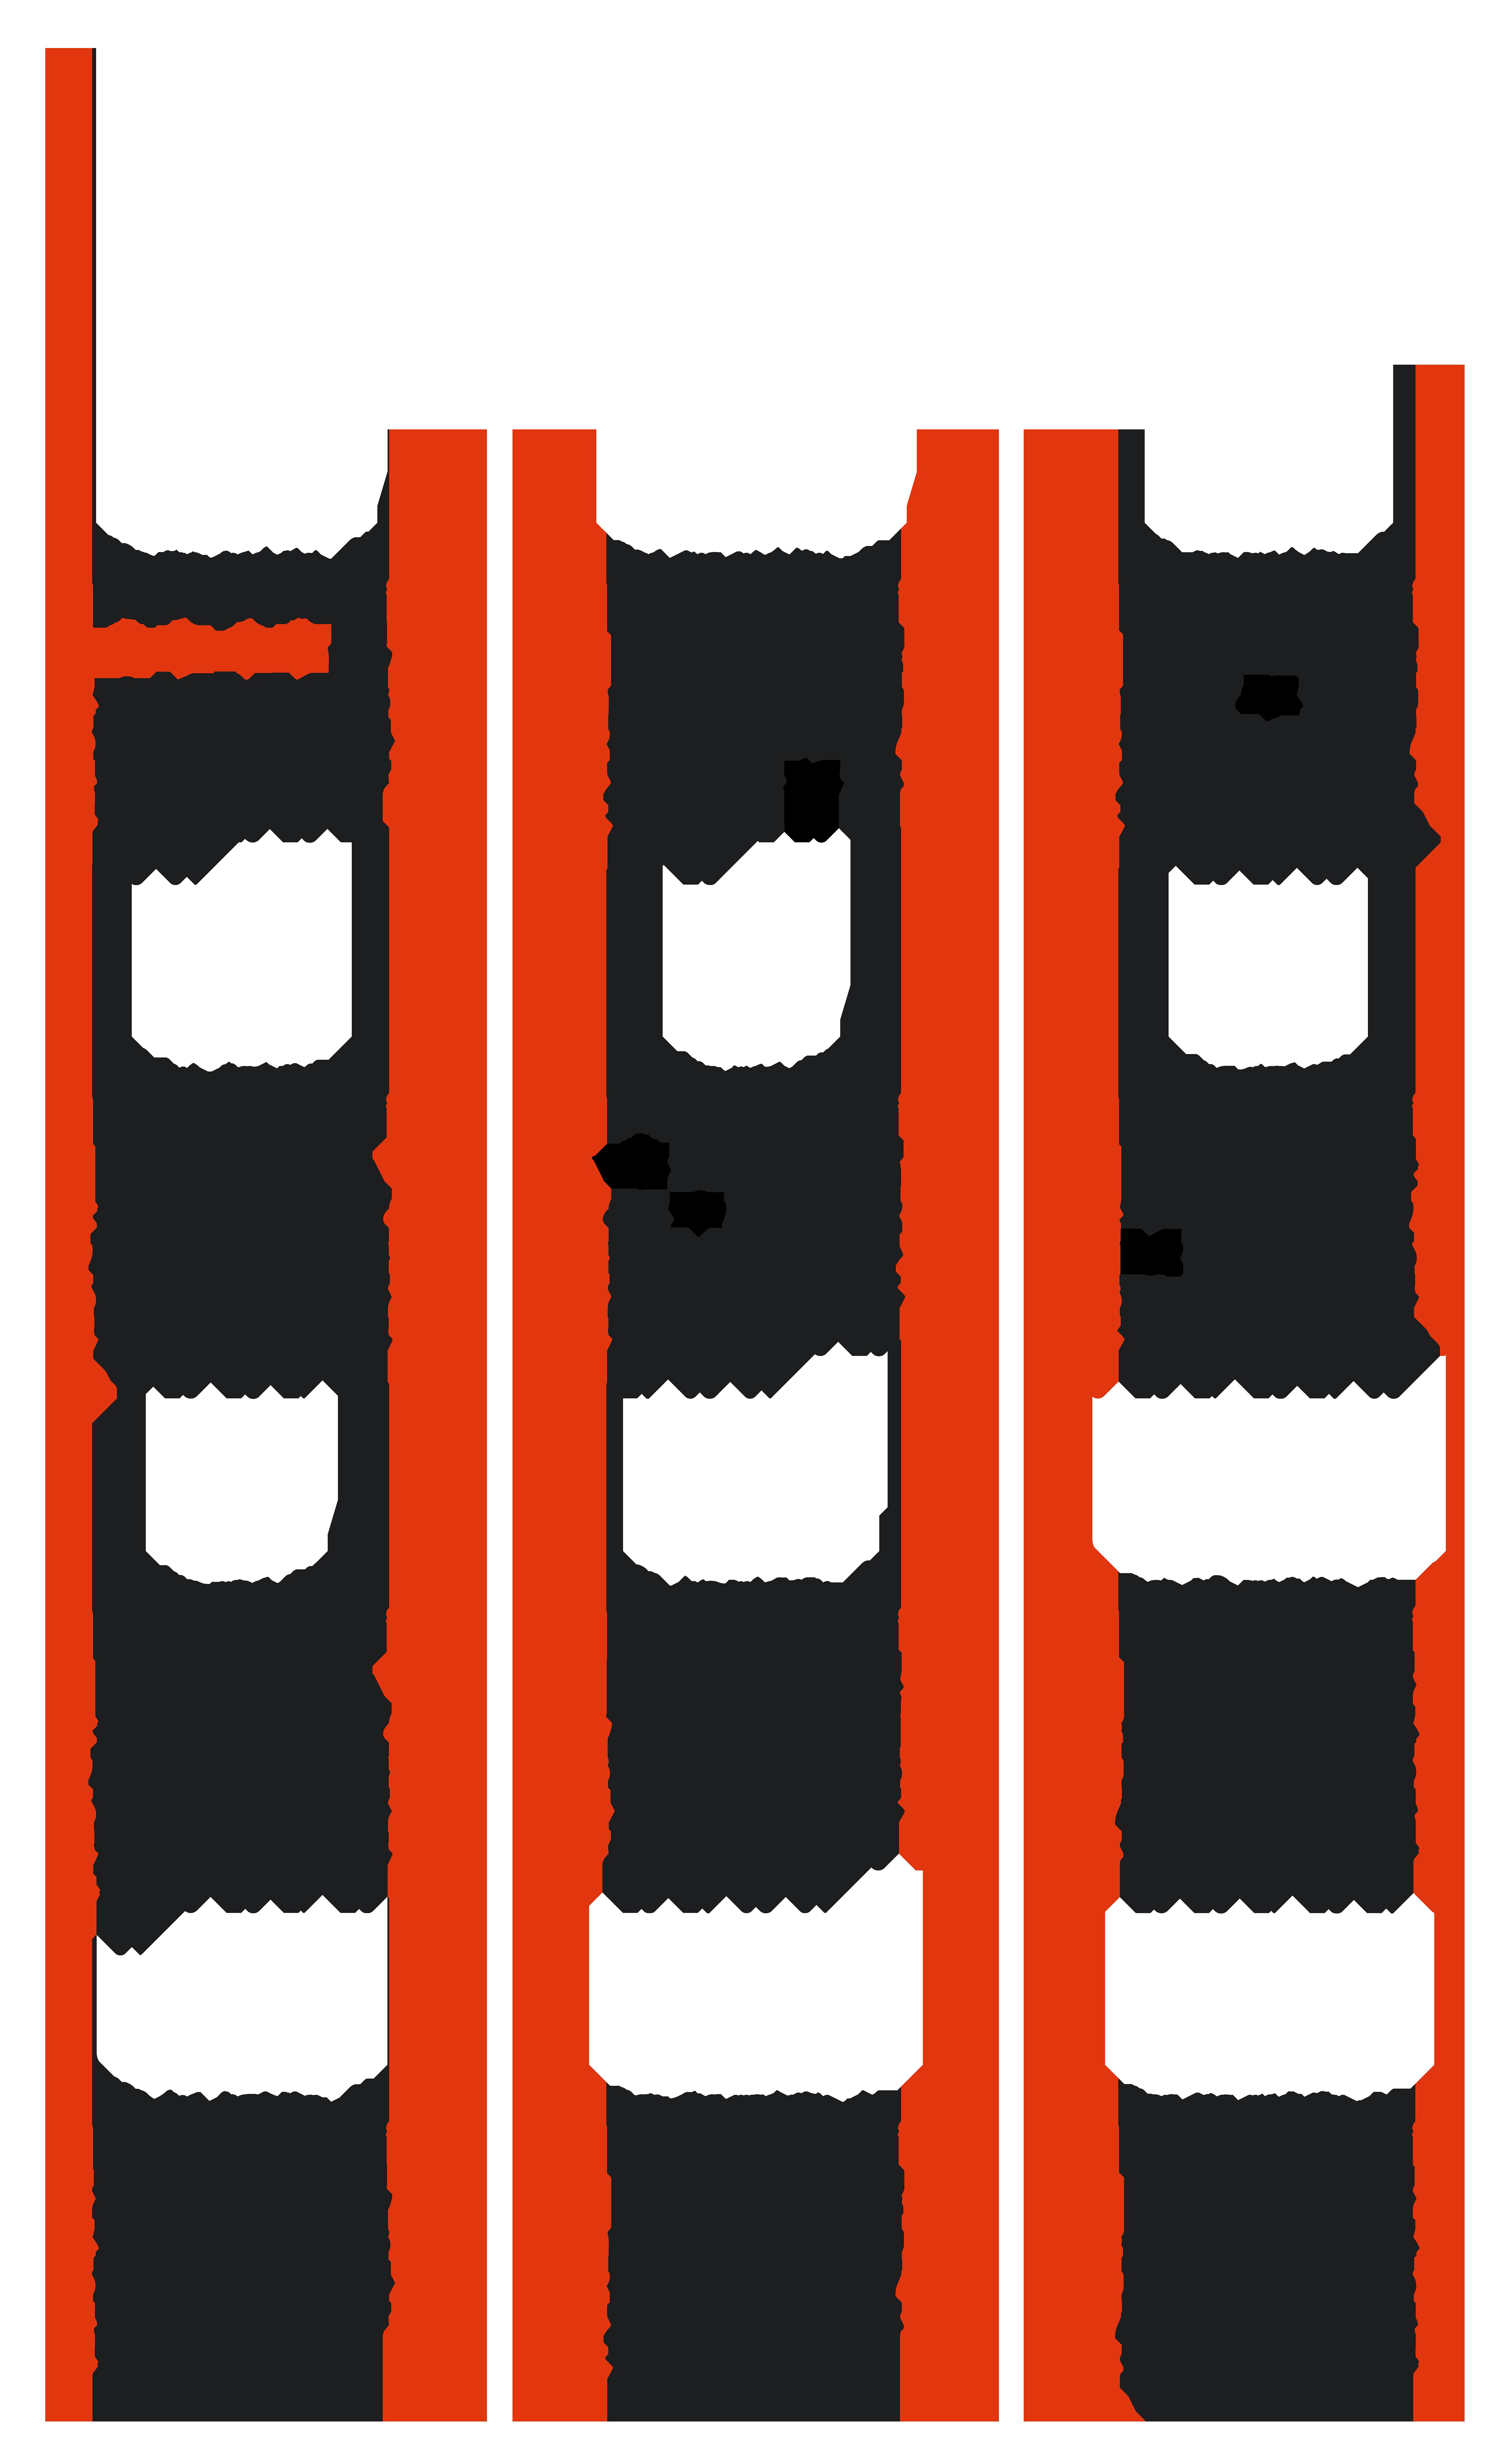 transparent png image. Schedule clipart calendar 2017